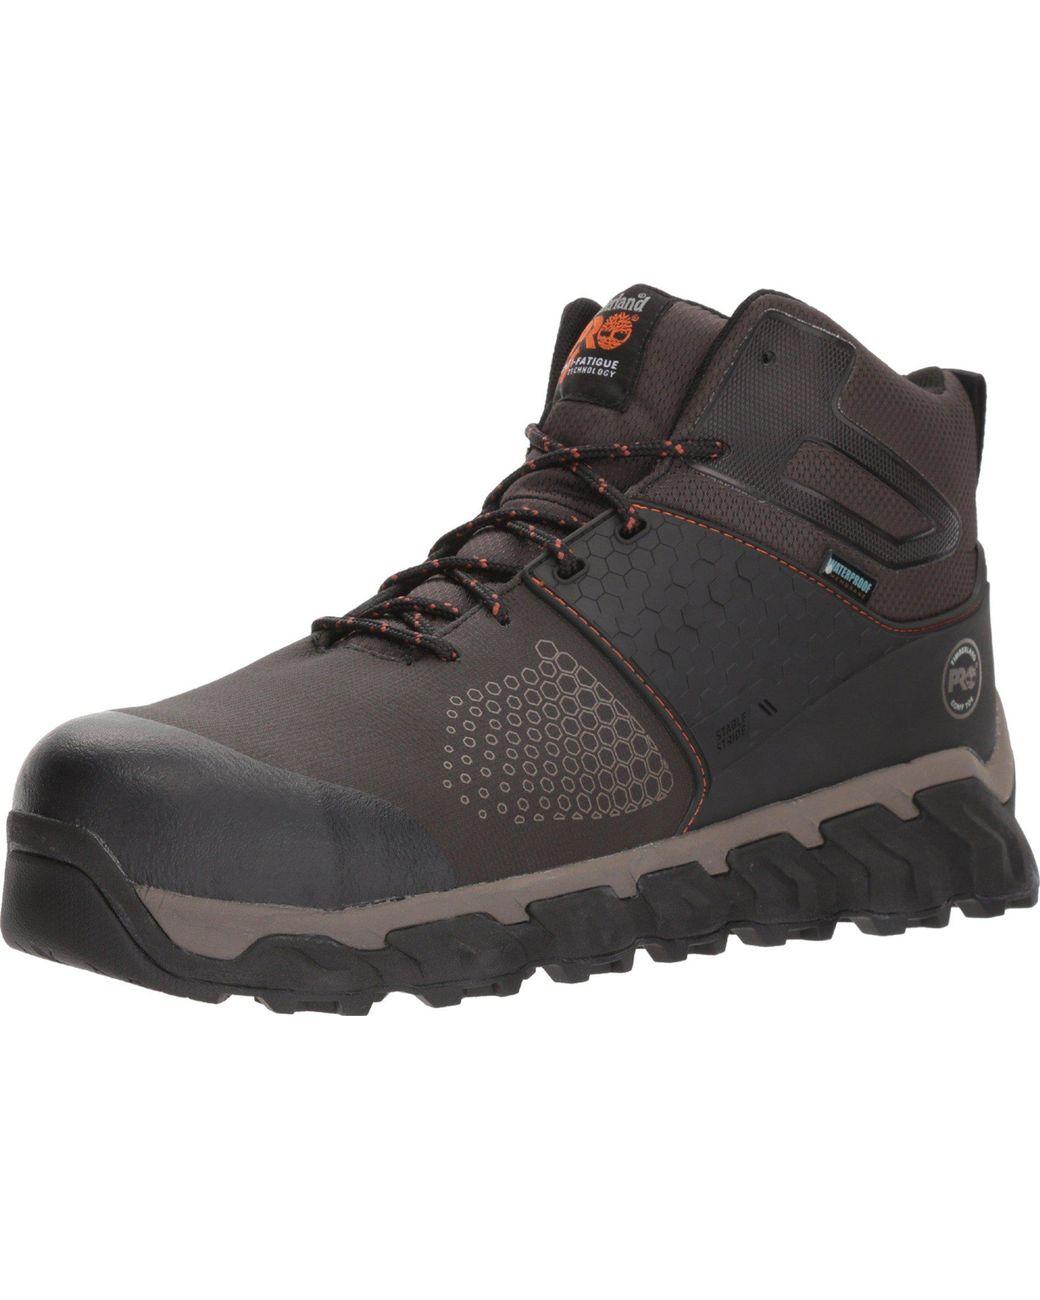 b8759f27a74 Men's Brown Ridgework Composite Safety Toe Waterproof Mid